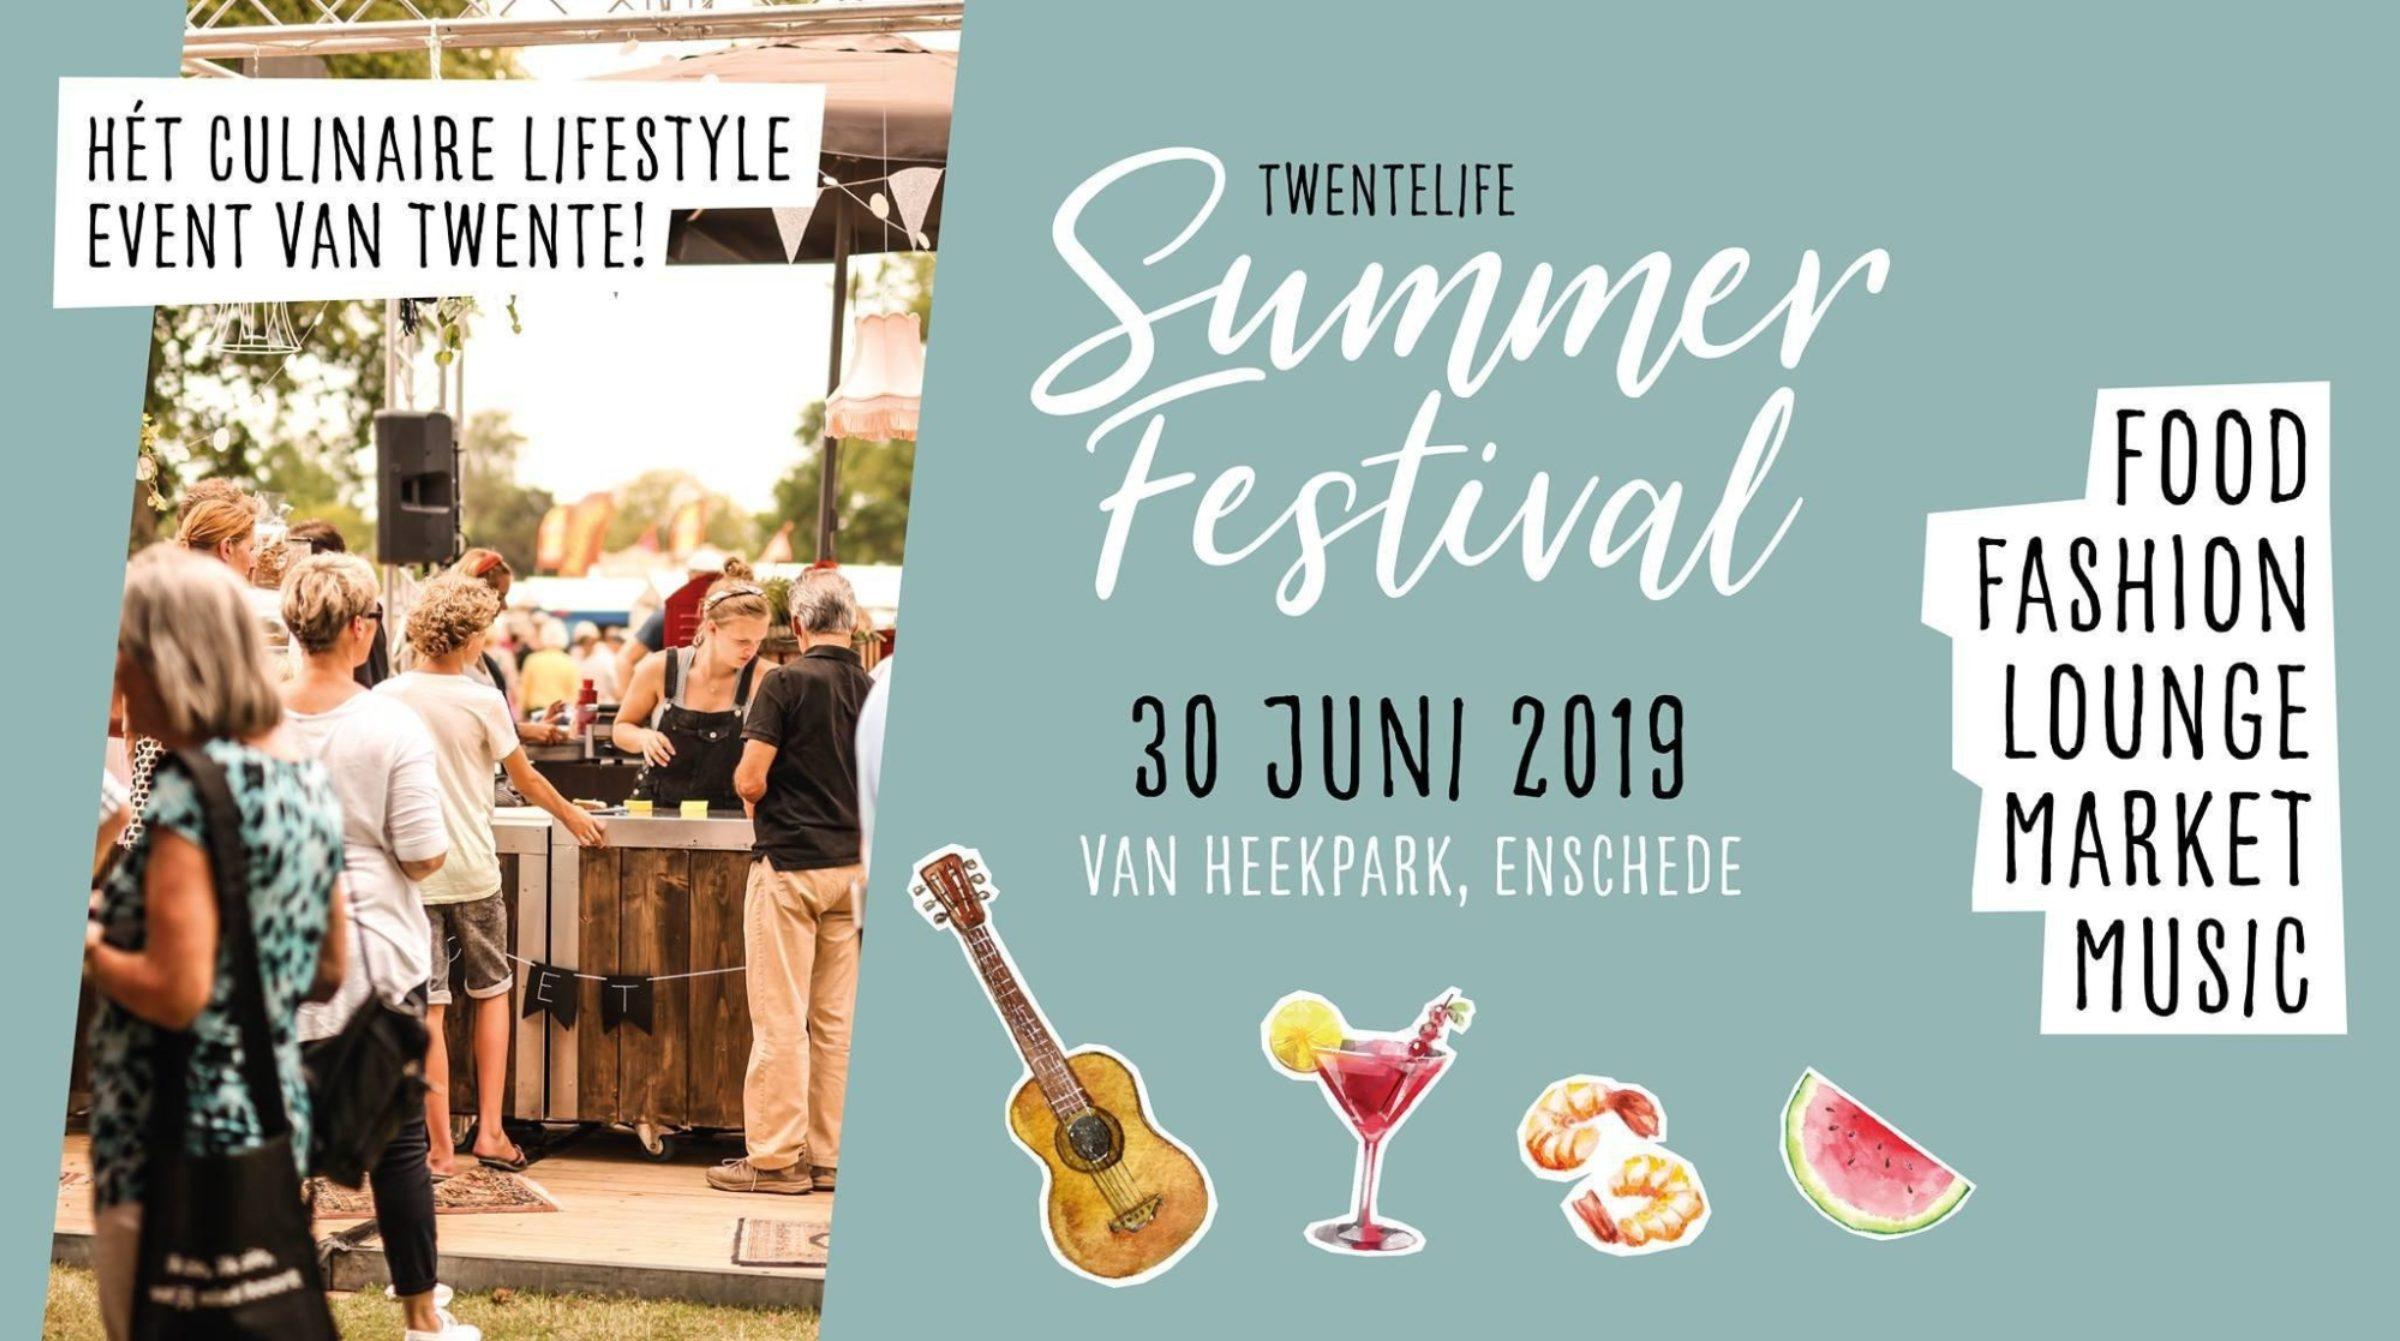 Twentelife Summer Festival 2527 1553527327 35hxekj5yd